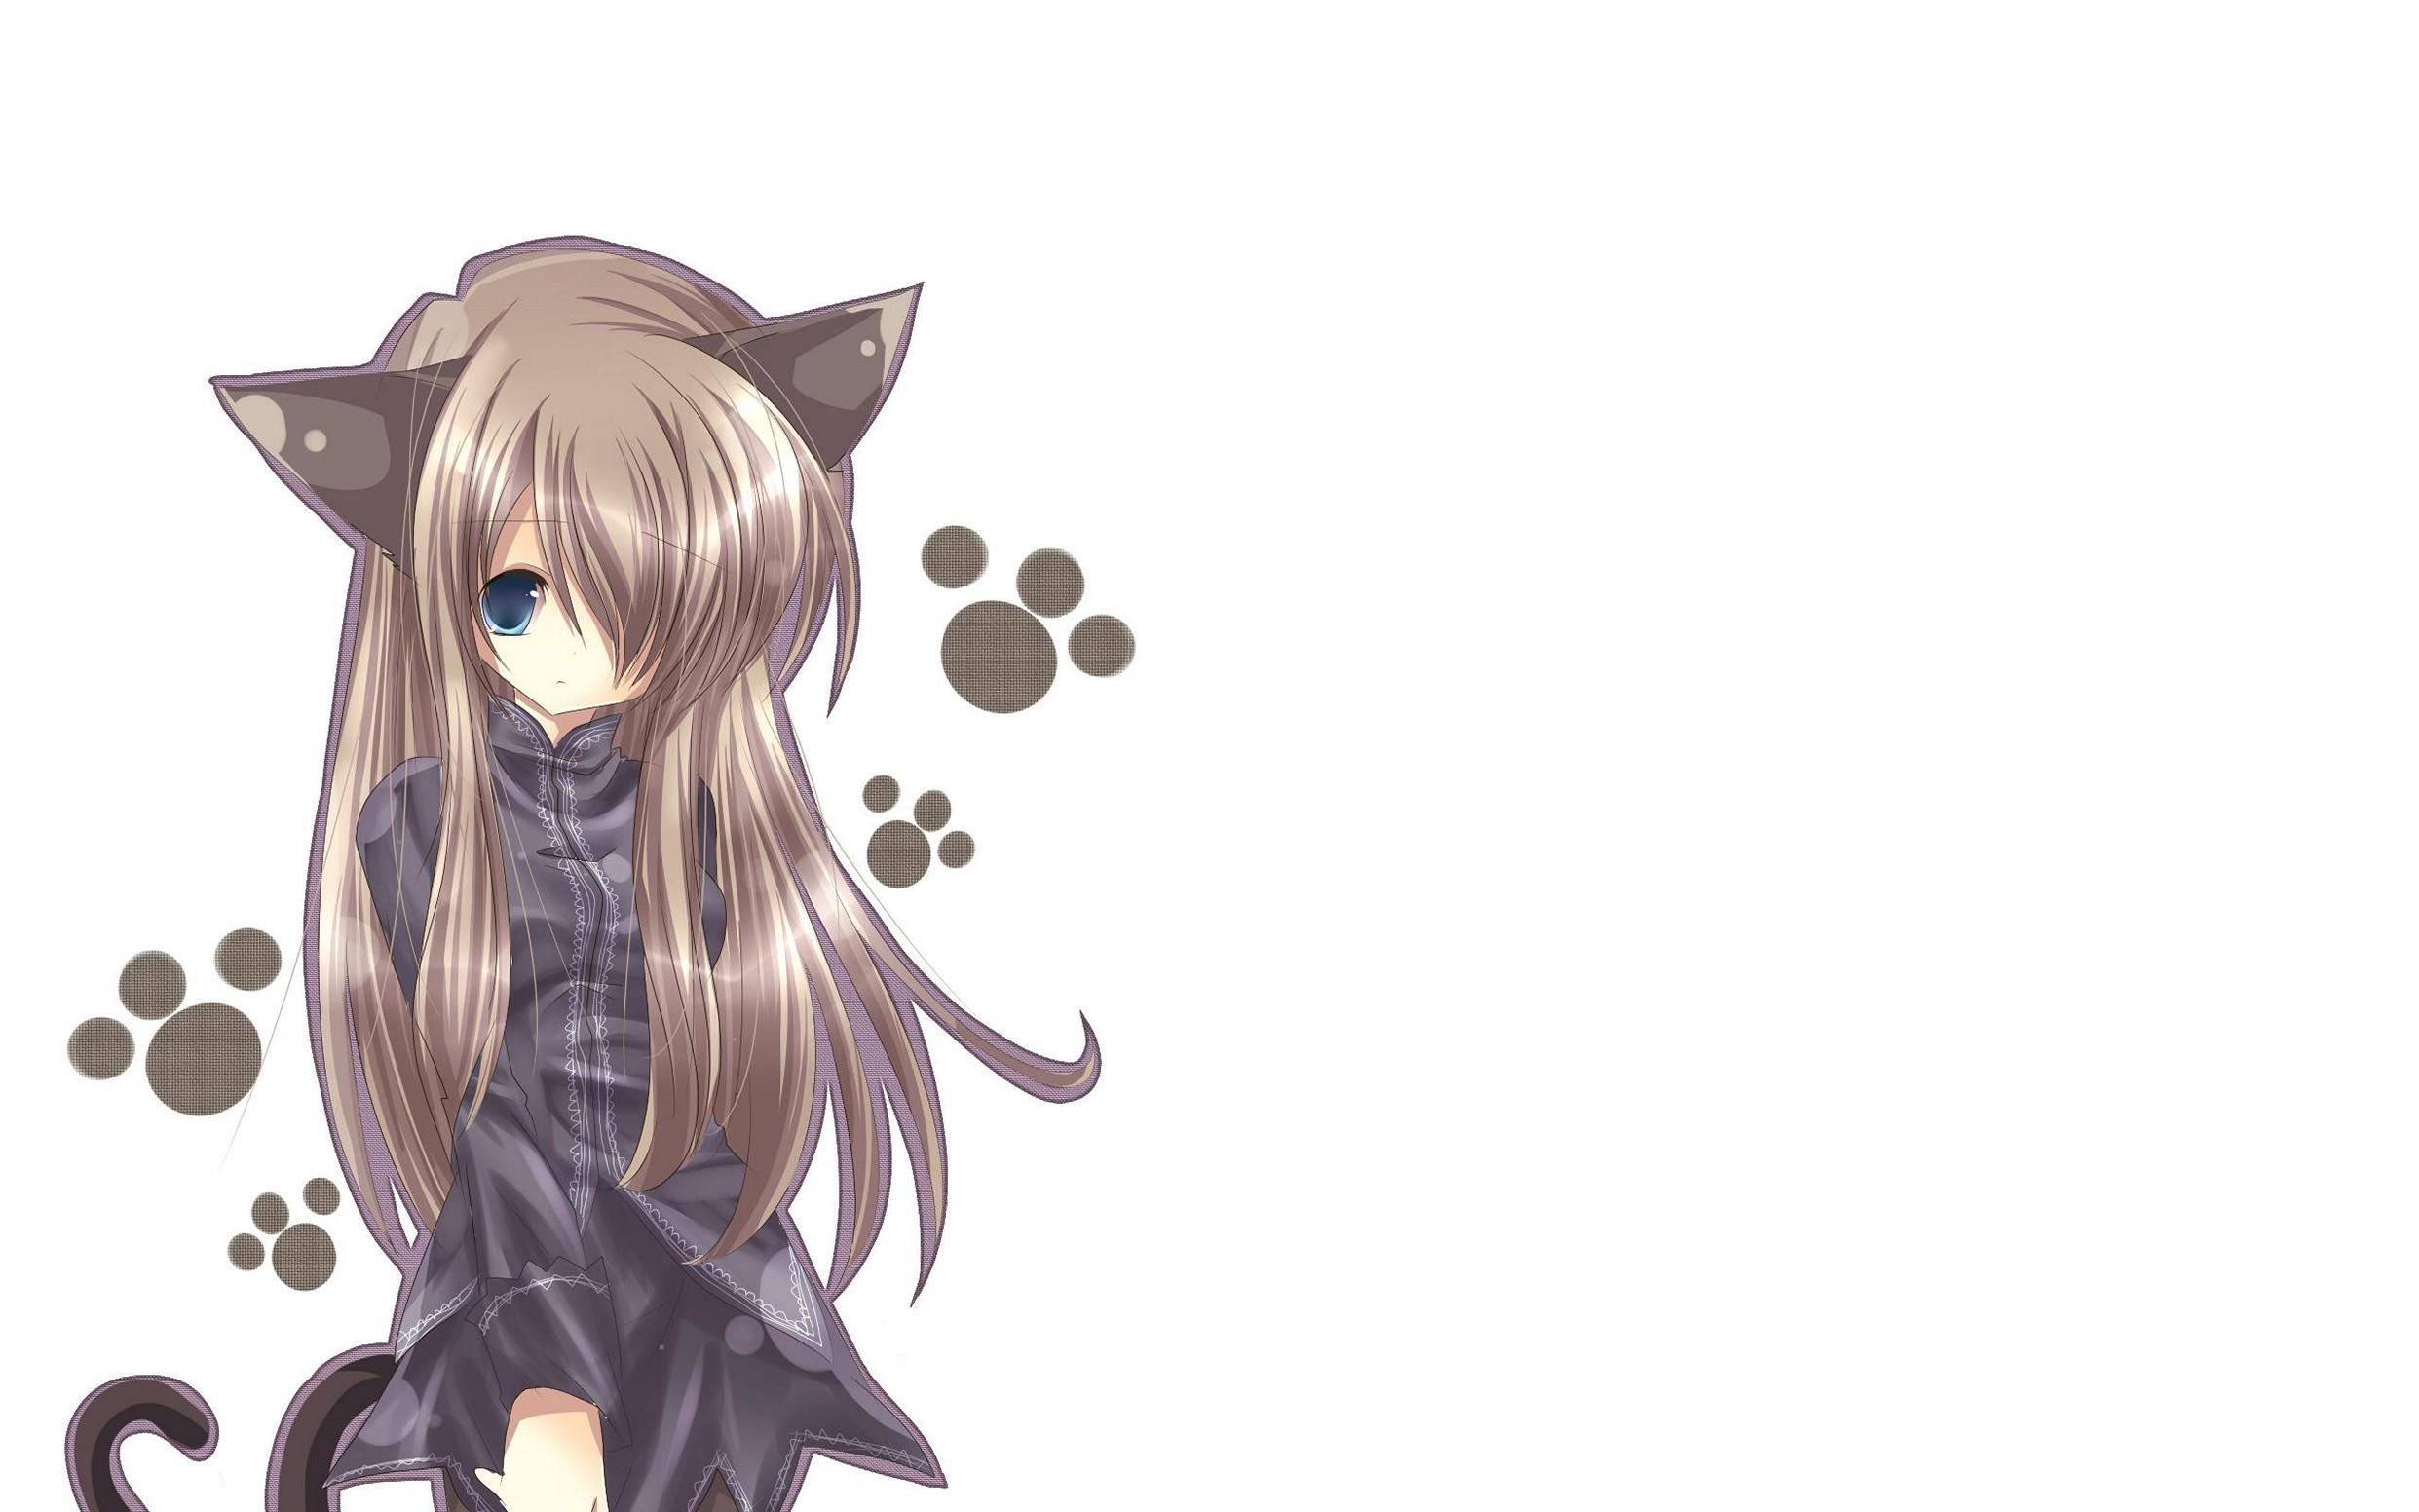 Cat Girl Nekomimi Art Girl Superb Anime Wallpapers Hd